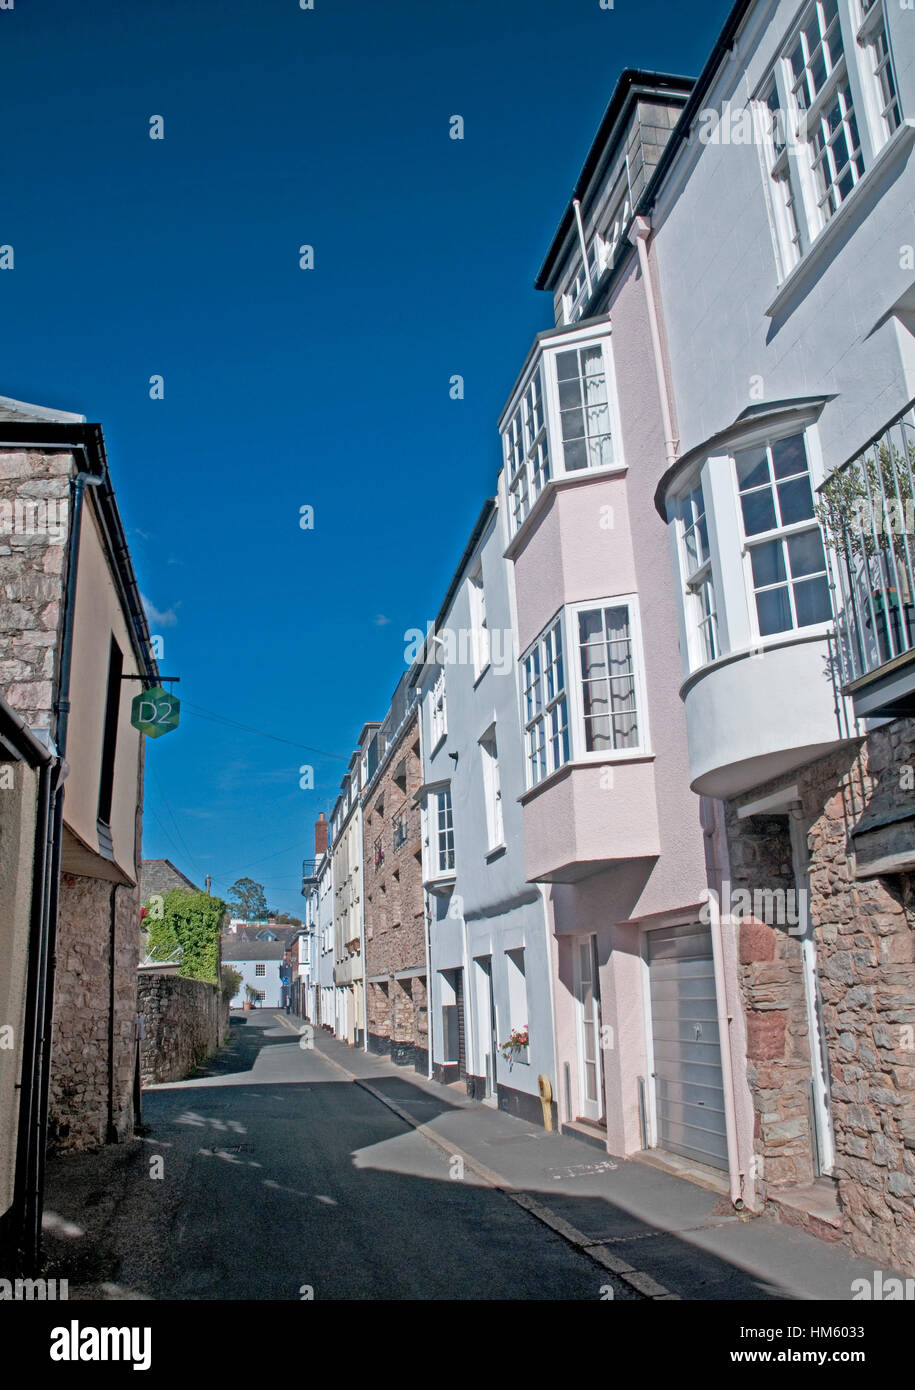 Topsham in Devon - Stock Image